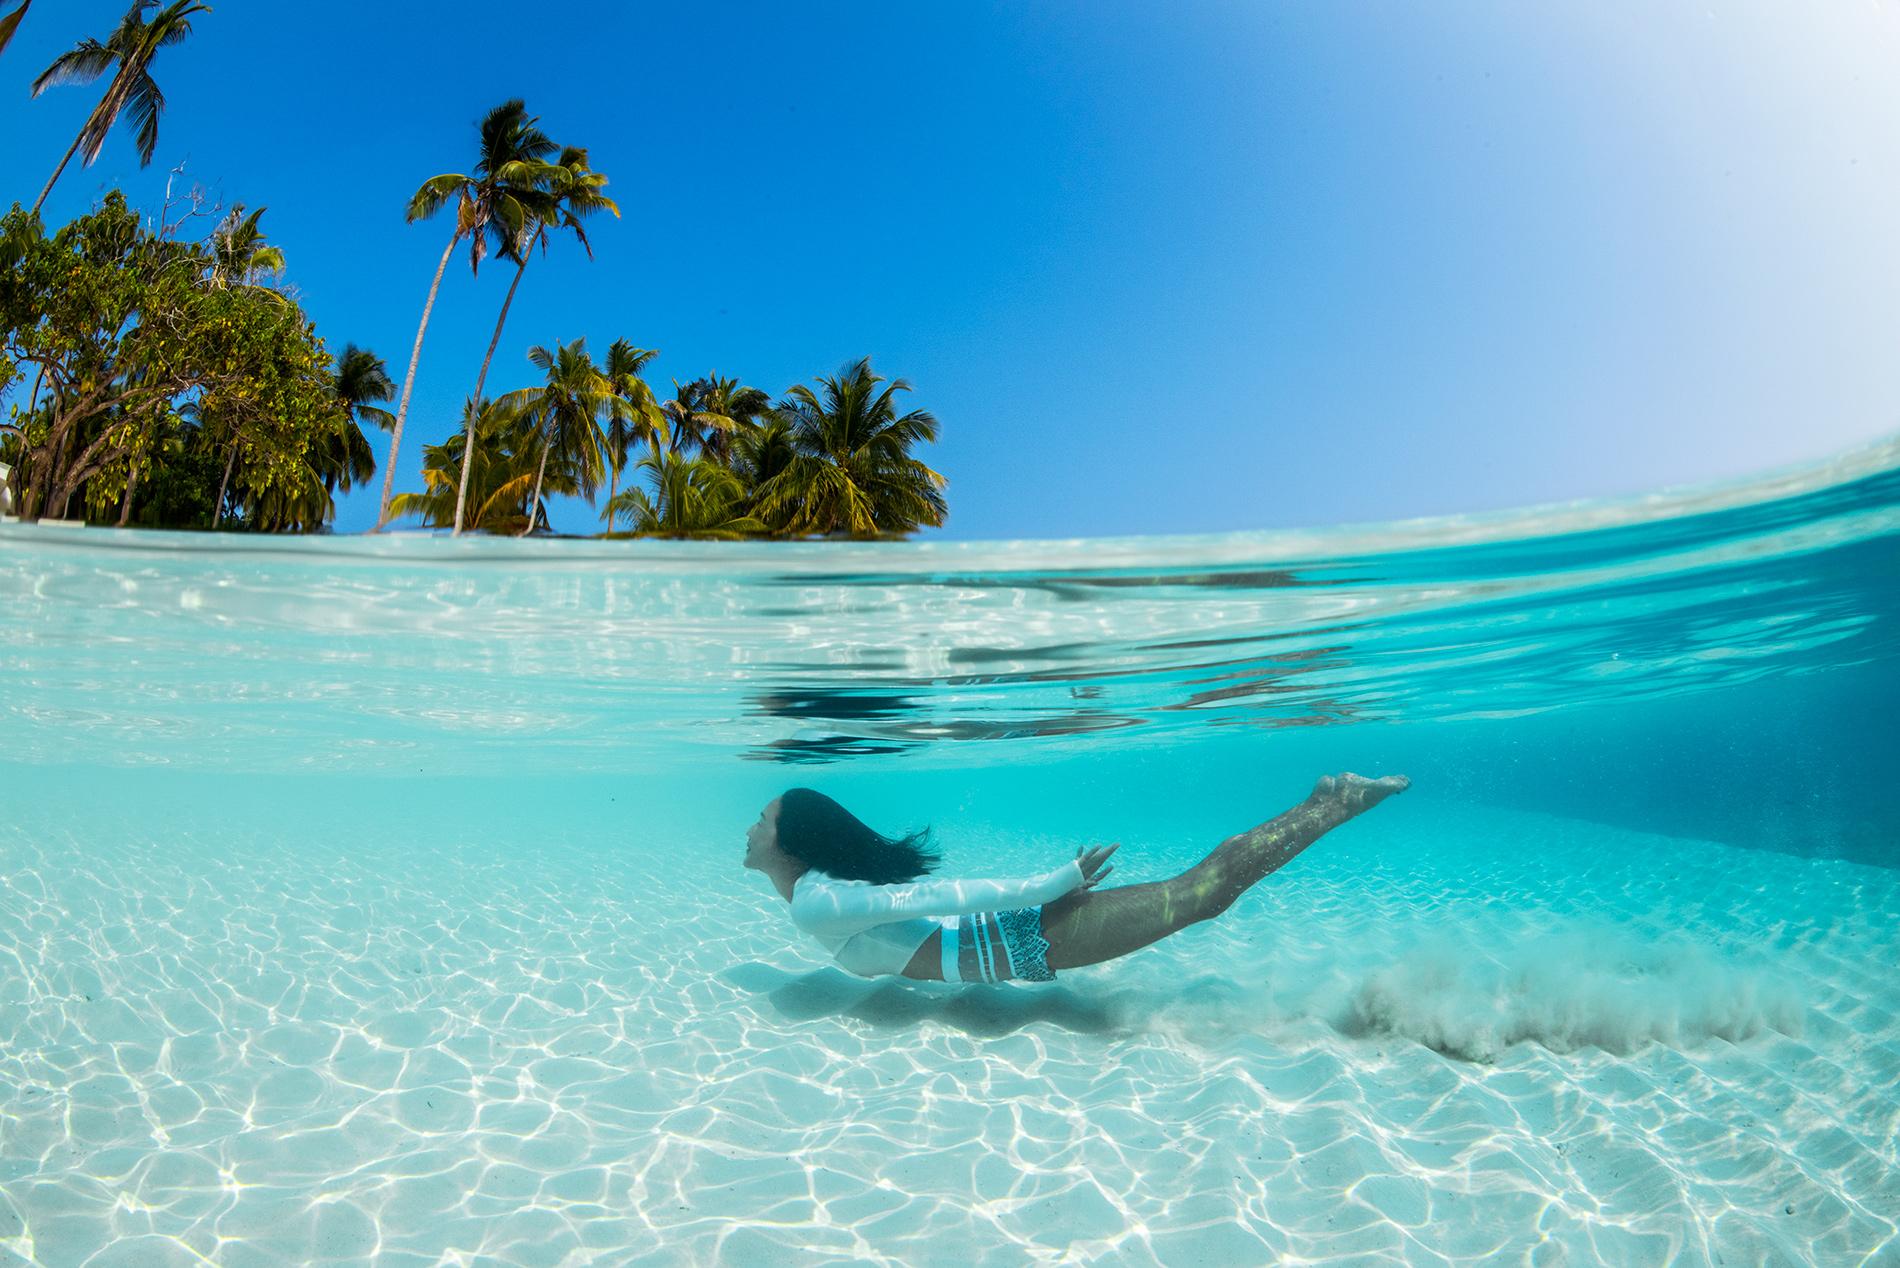 Diving in the Maldives via Gary Pepper Girl